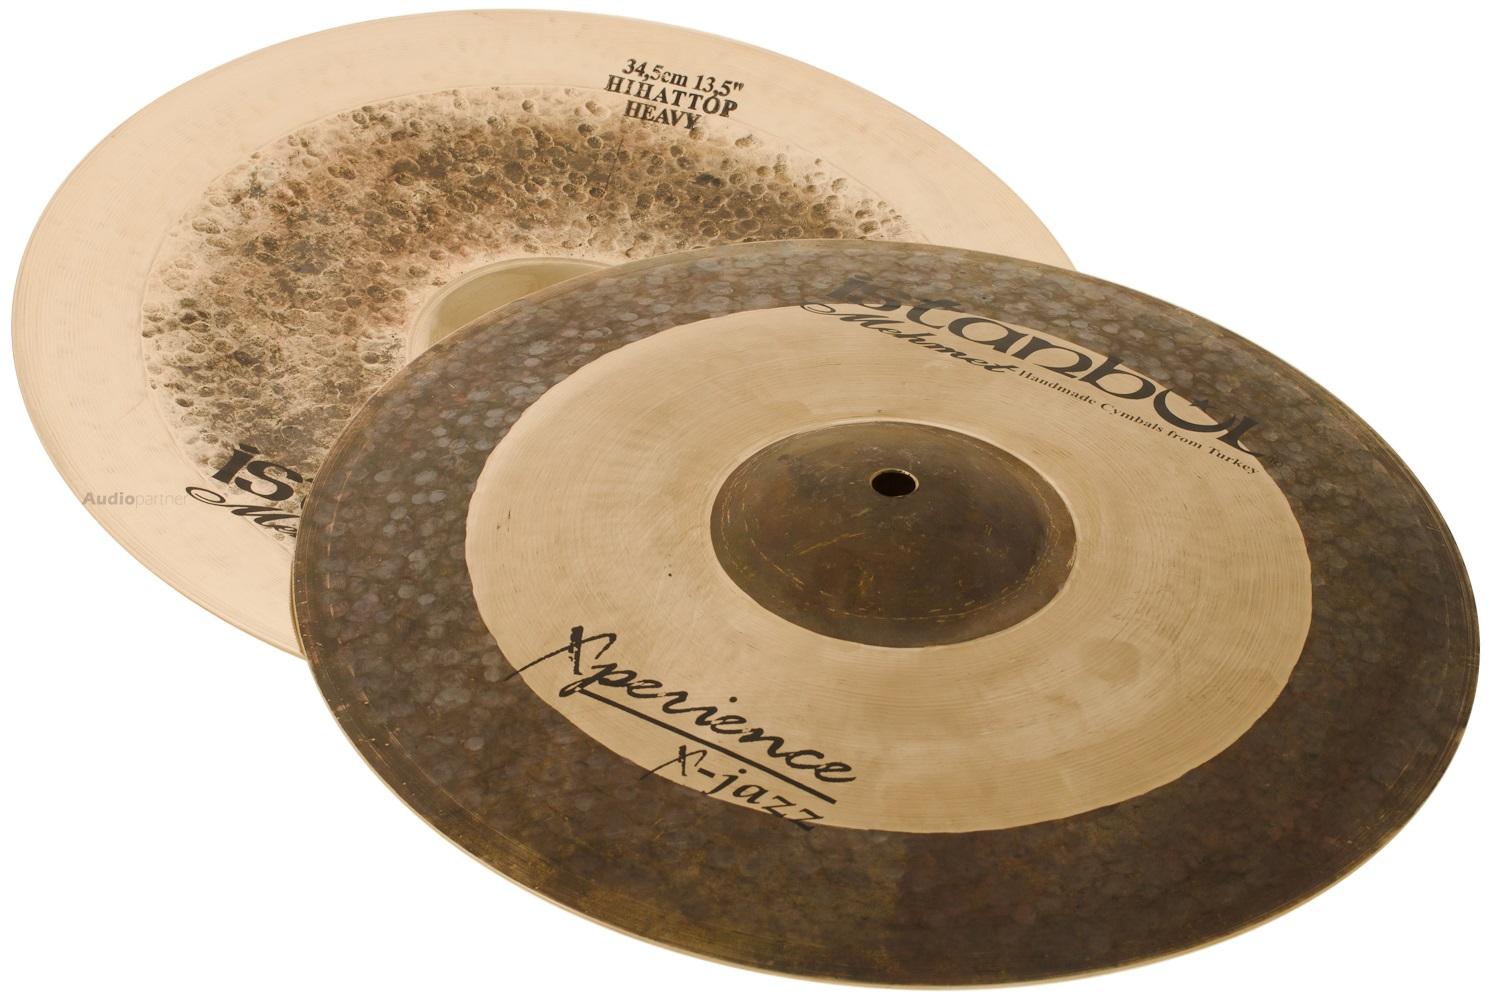 "ISTANBUL MEHMET 13,5"" Xperience X-Jazz Fusion Medium hi-hat Činely hi-hat"